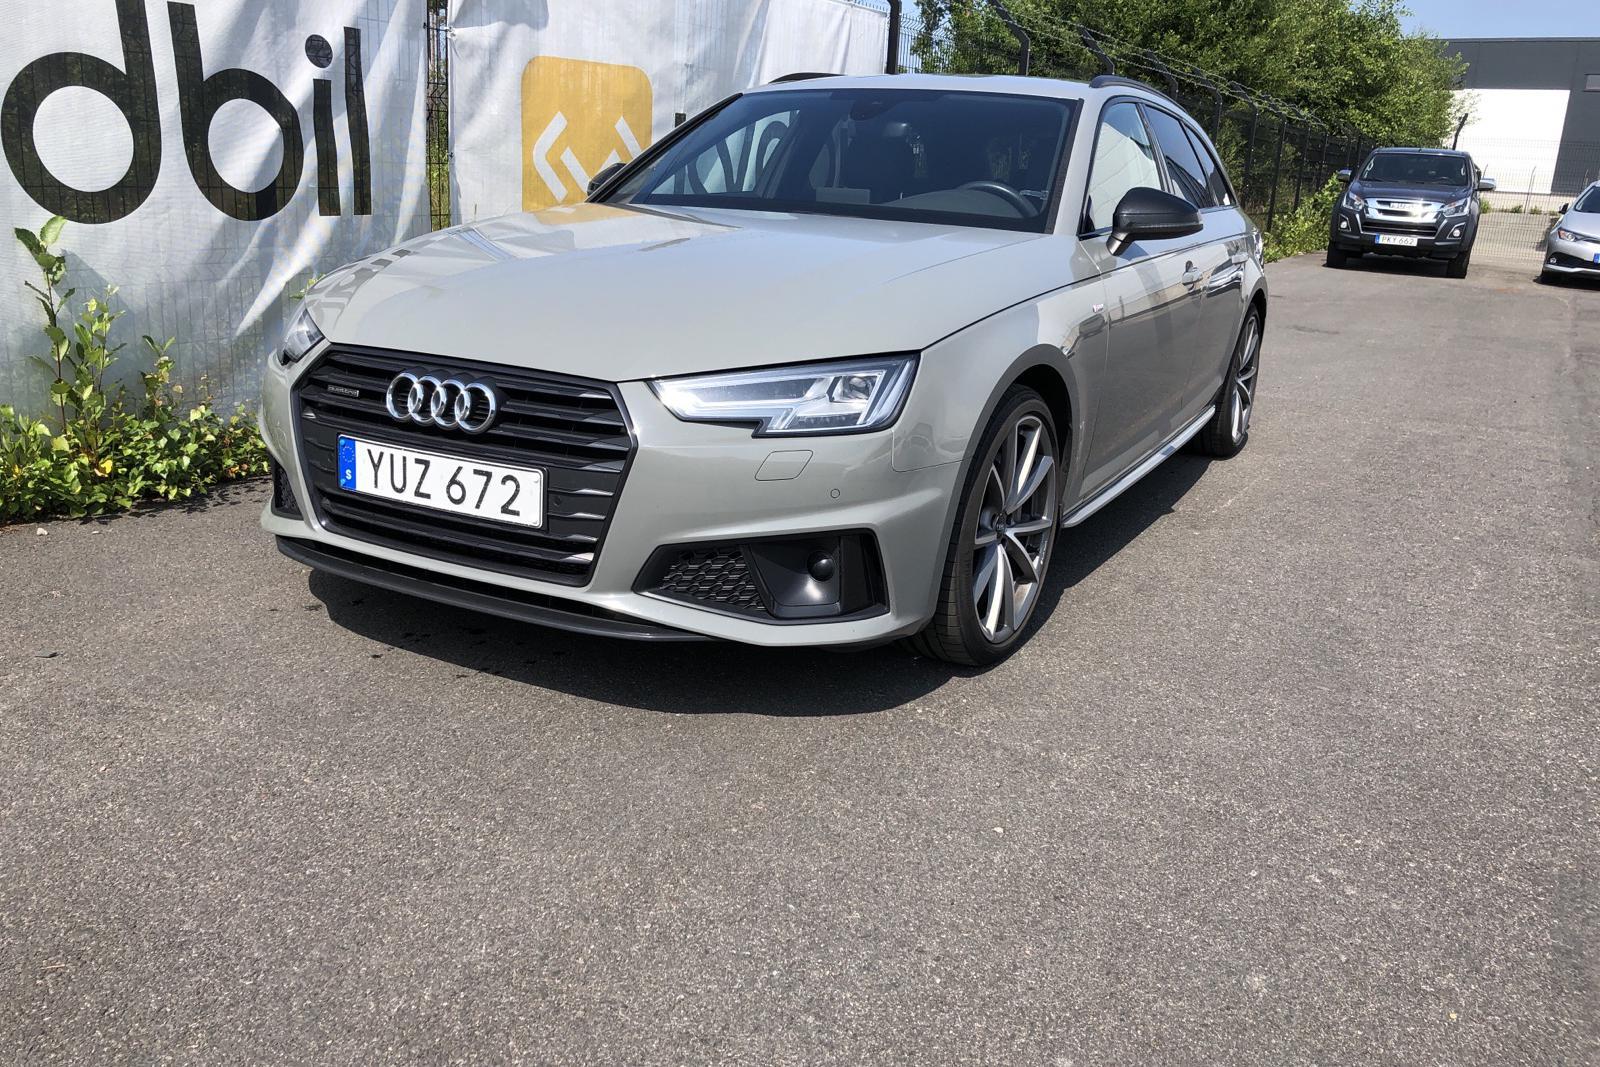 Audi A4 Avant 40 TDI quattro (190hk) - 106 530 km - Automatic - gray - 2019